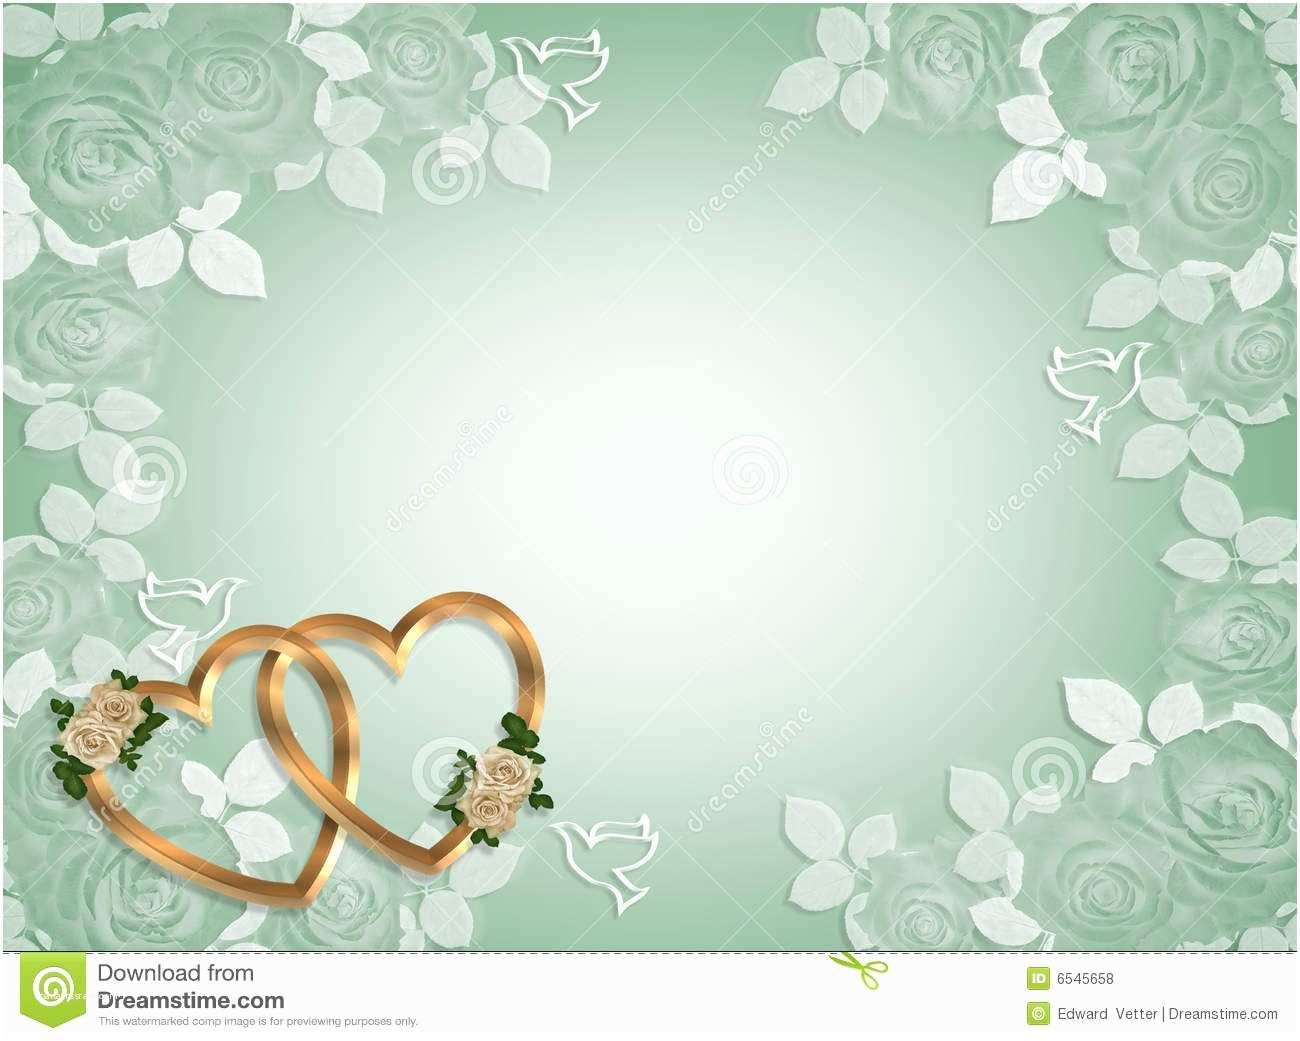 Wedding Invitation Design Images top Pilation Wedding Invitation Templates Free